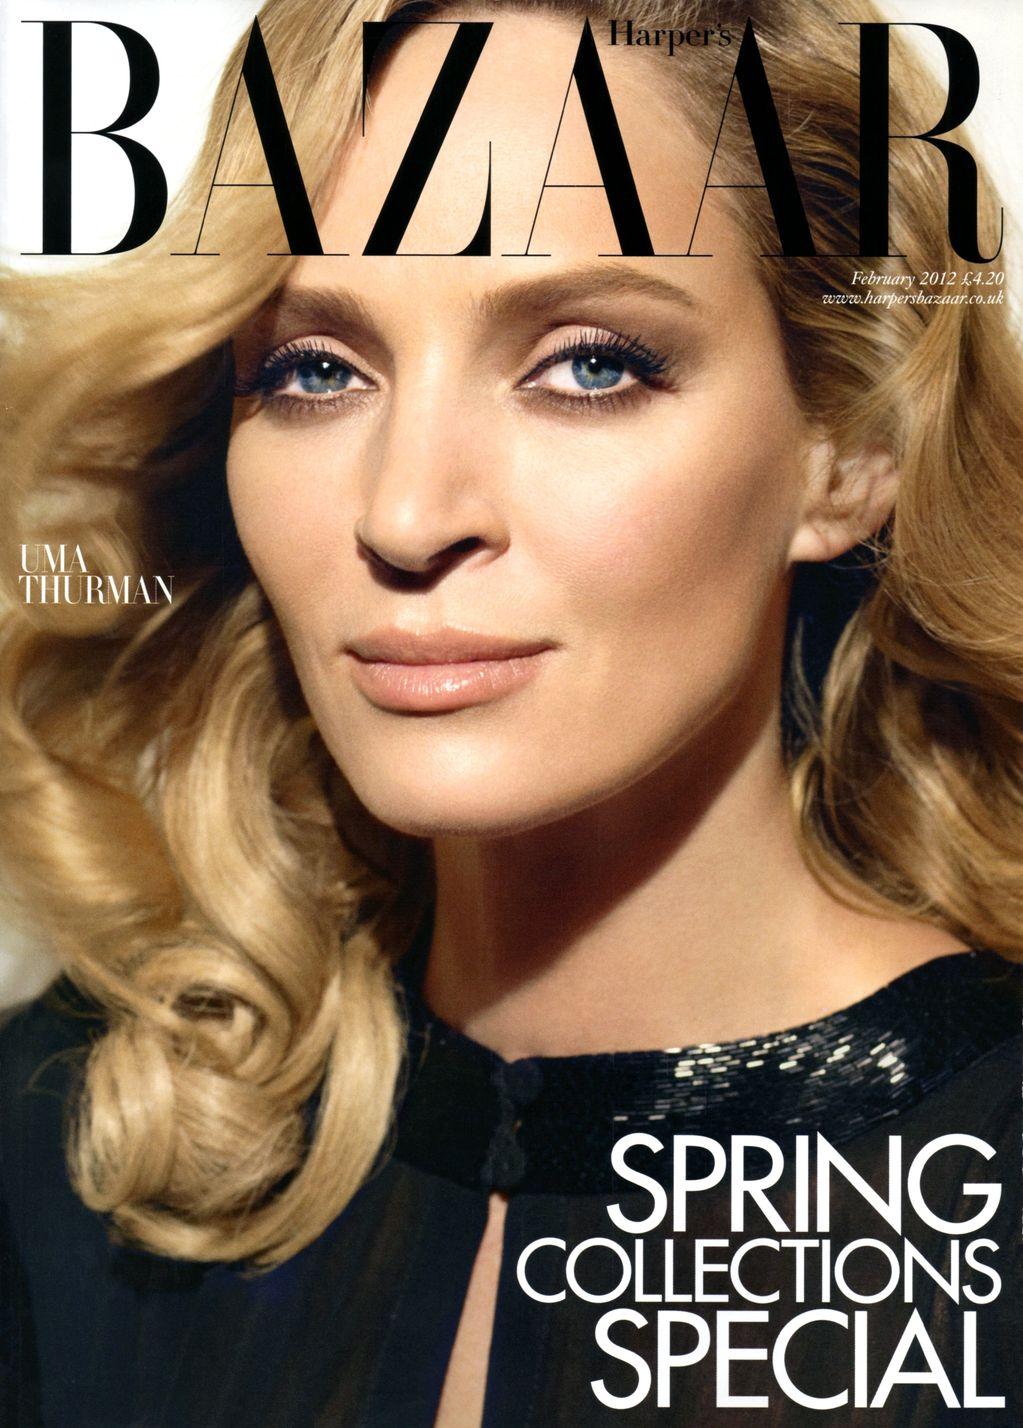 Uma Thurman British Harper's Bazaar Cover February 2012